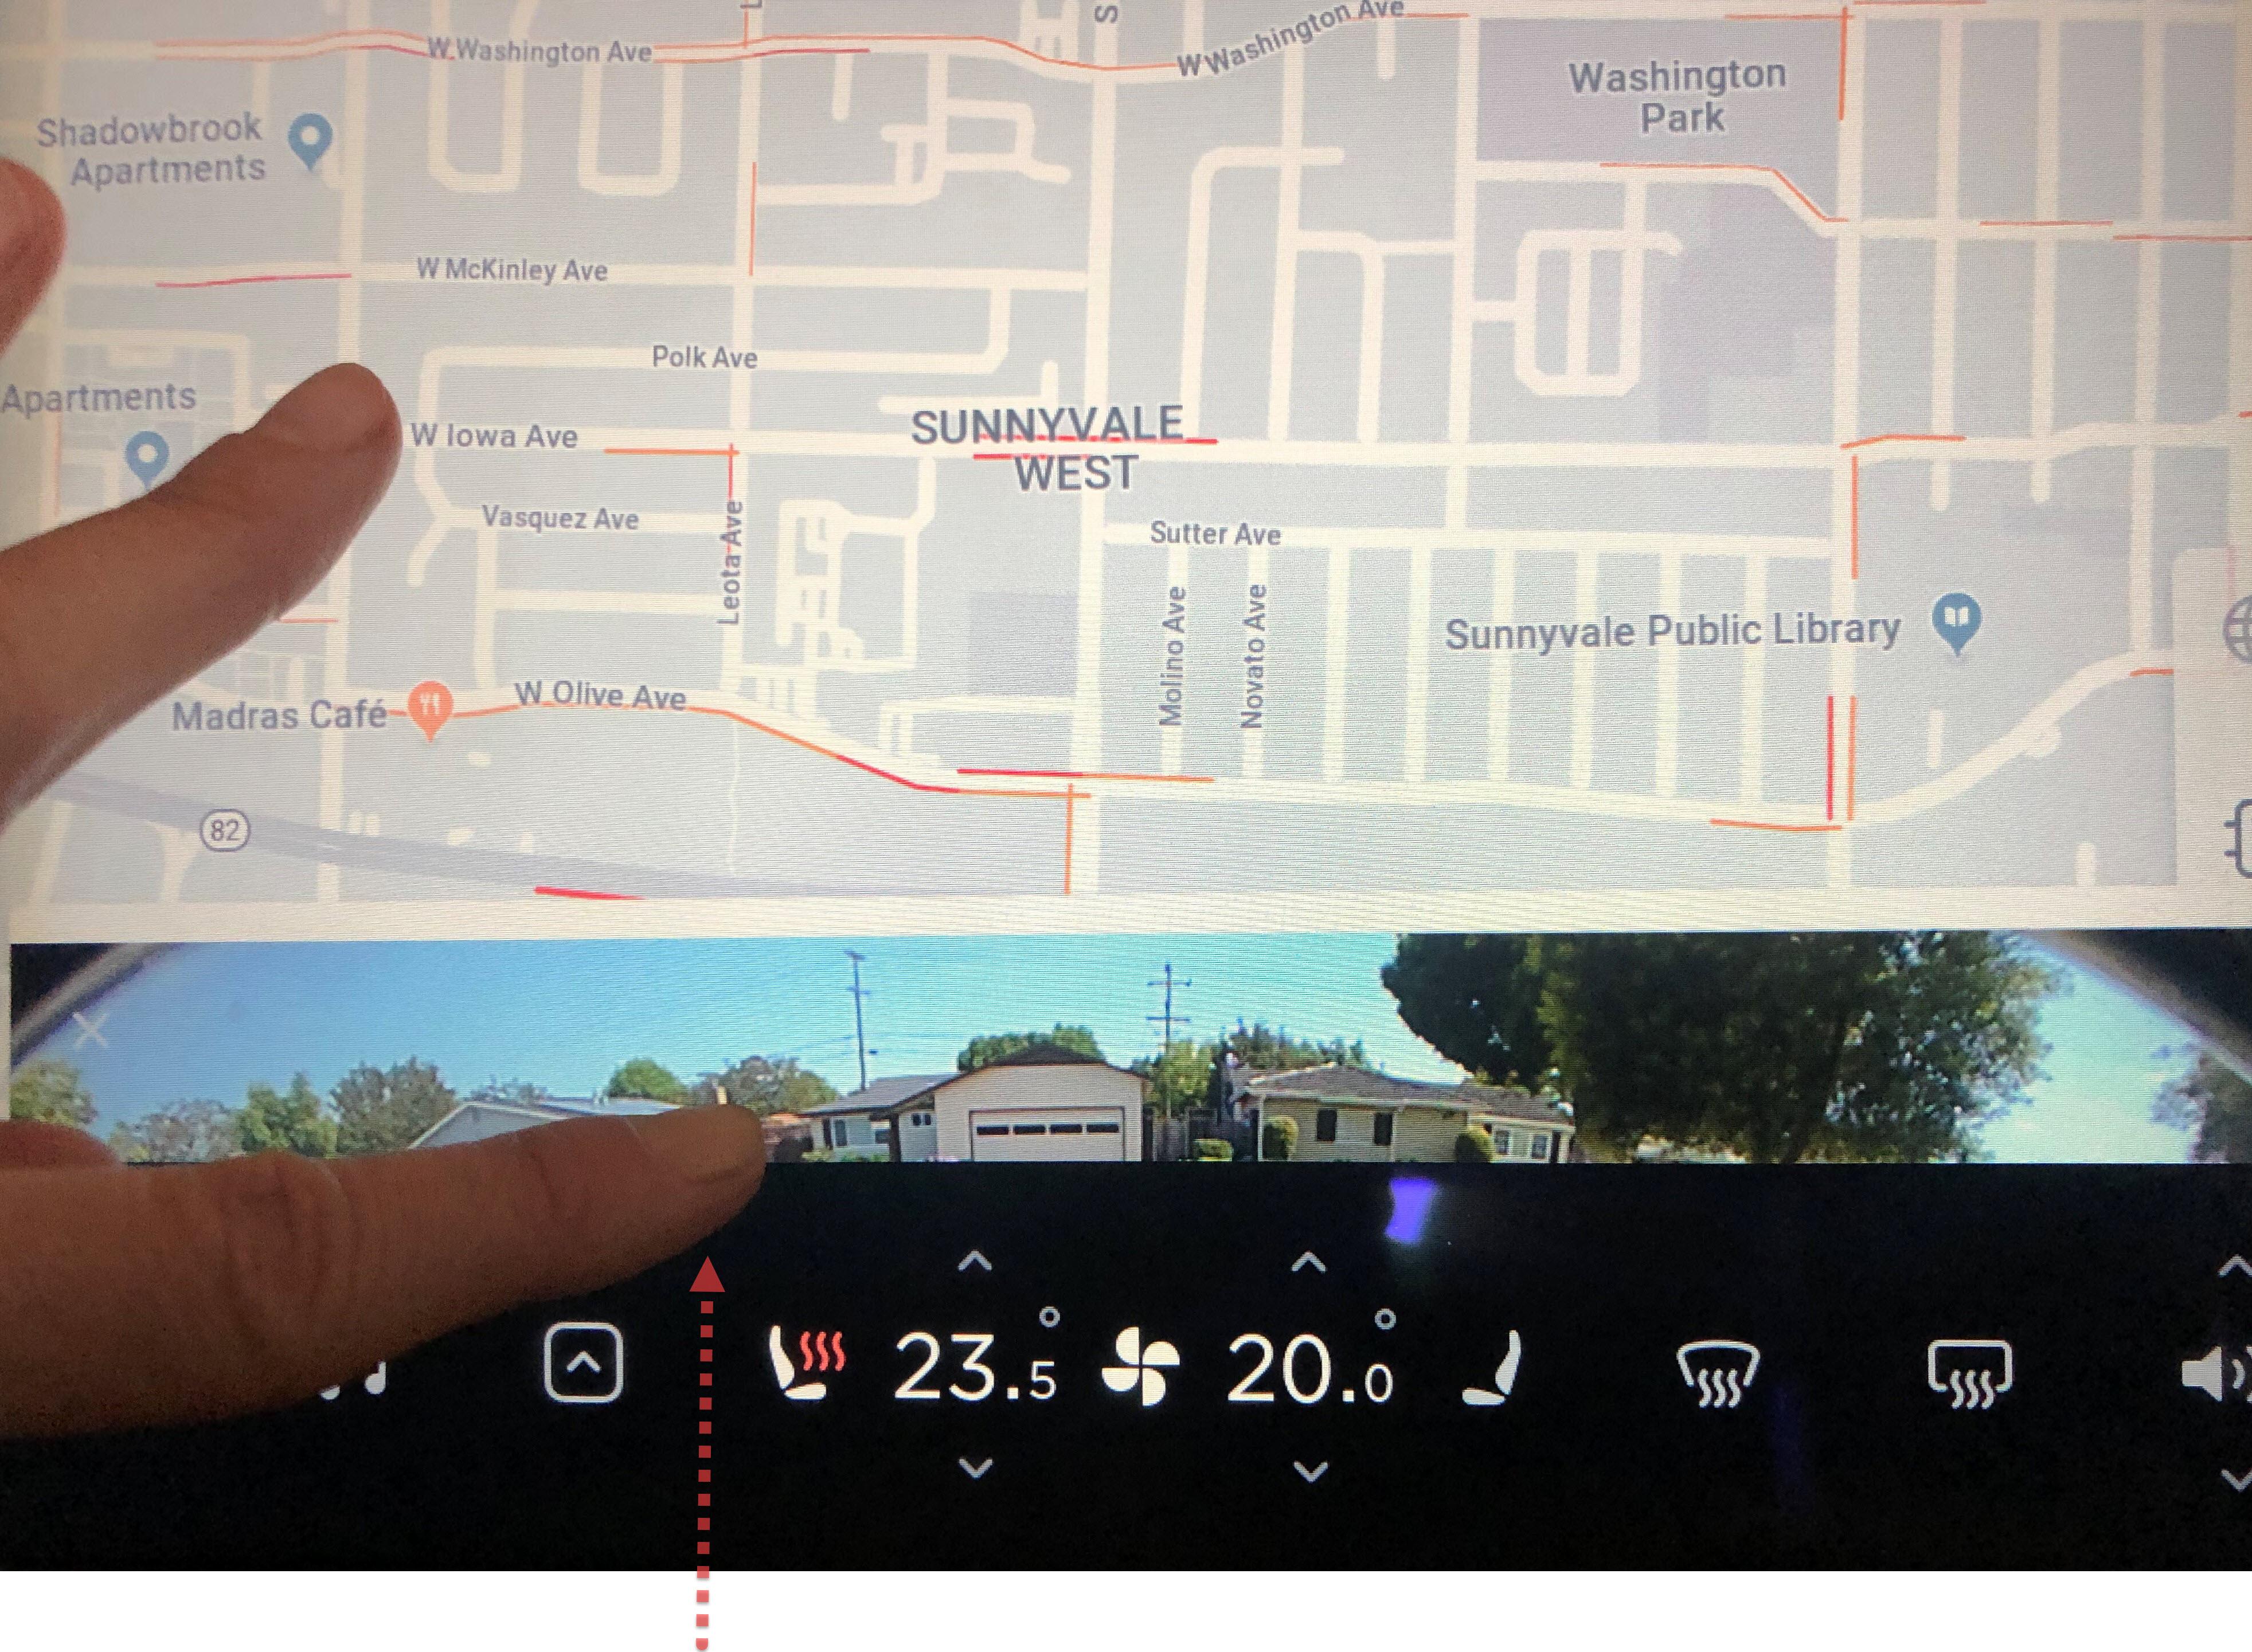 Tesla's Touchscreen UI: A Case Study of Car-Dashboard User